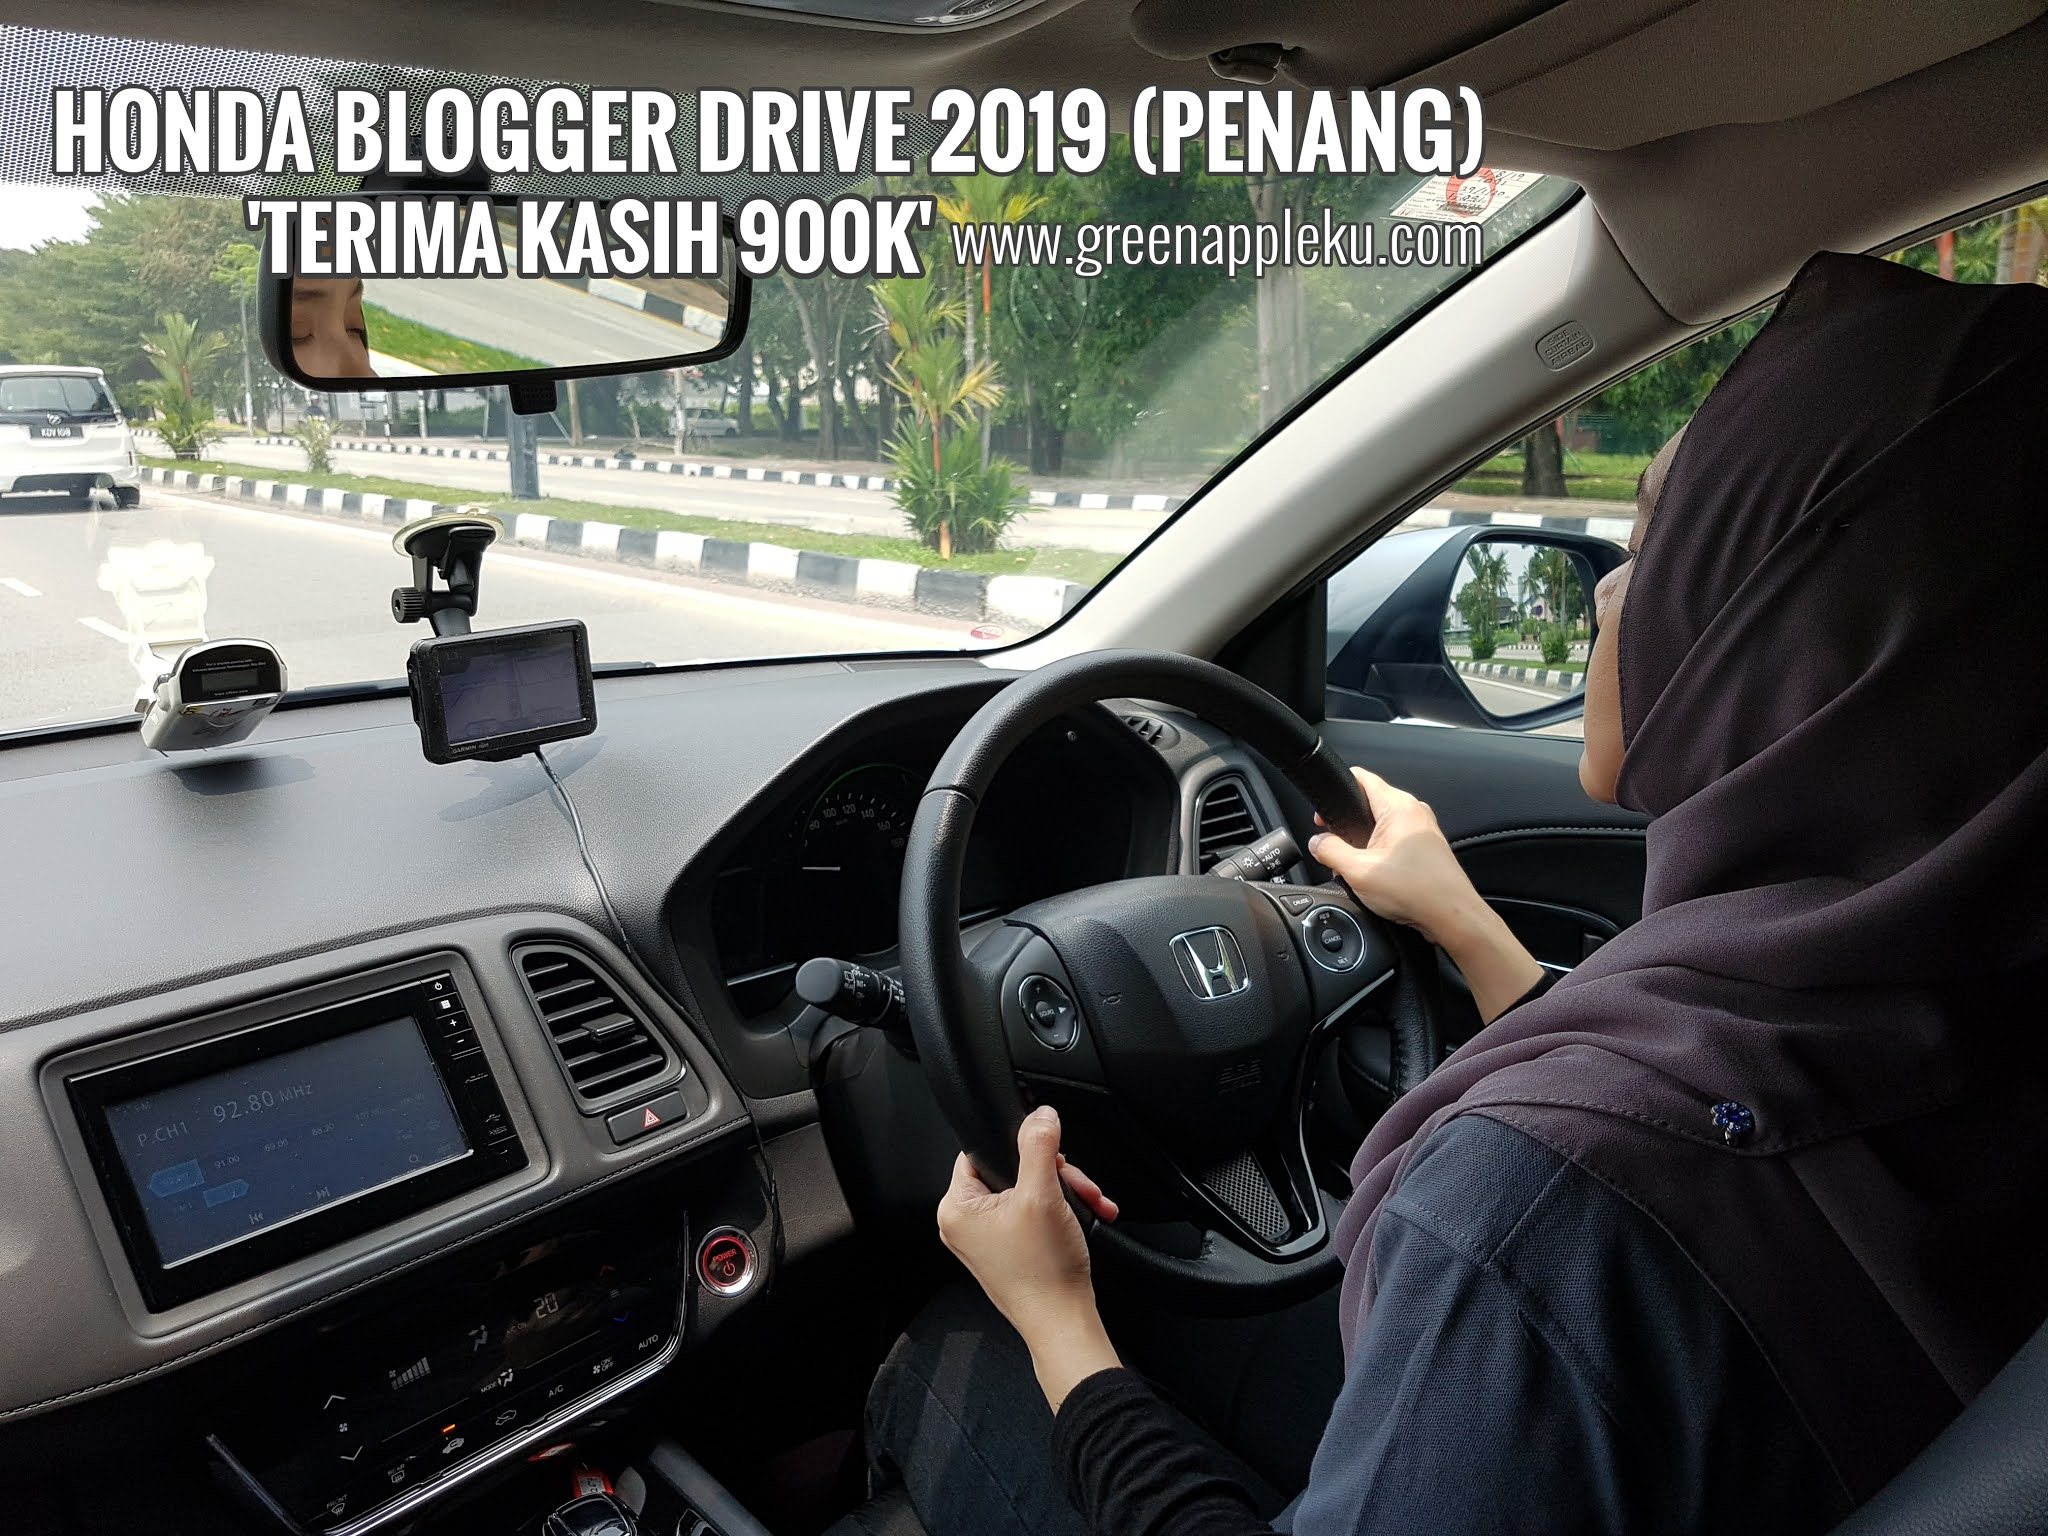 HONDA BLOGGER DRIVE 2019 (PENANG)